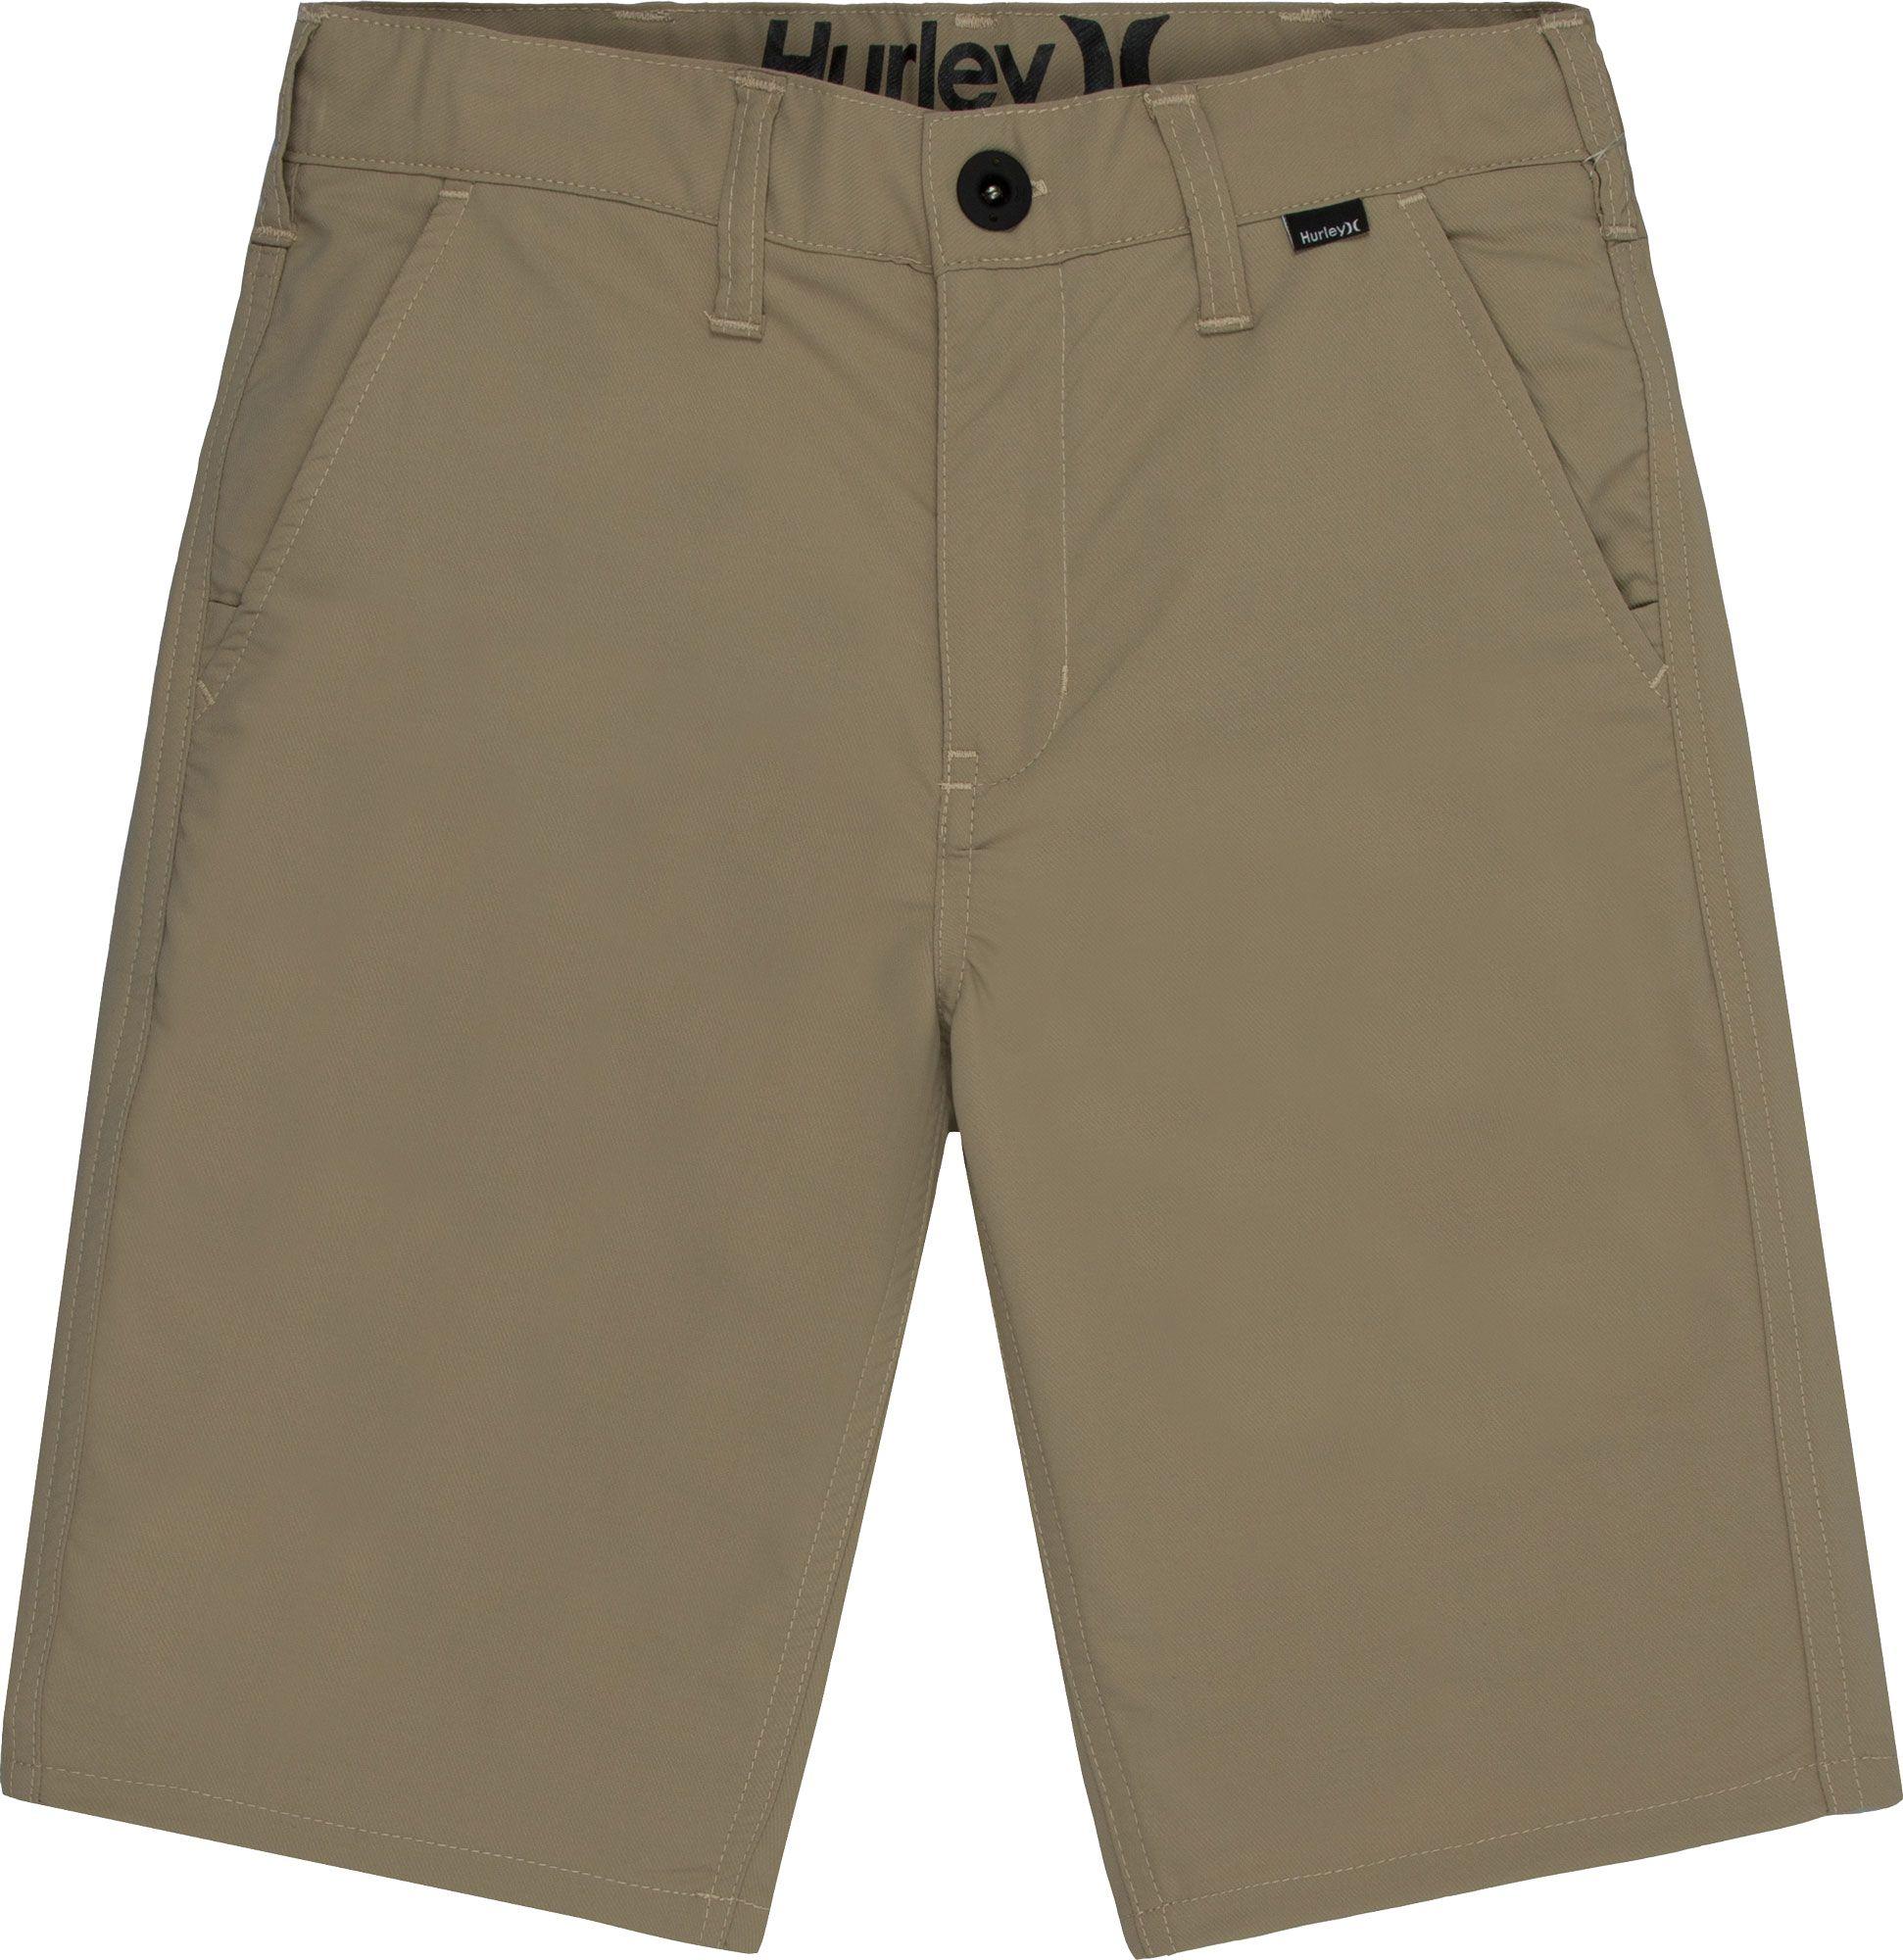 NEW Hurley beige khaki chino long skate walk shorts boys youth 10 12 14 16 18 20